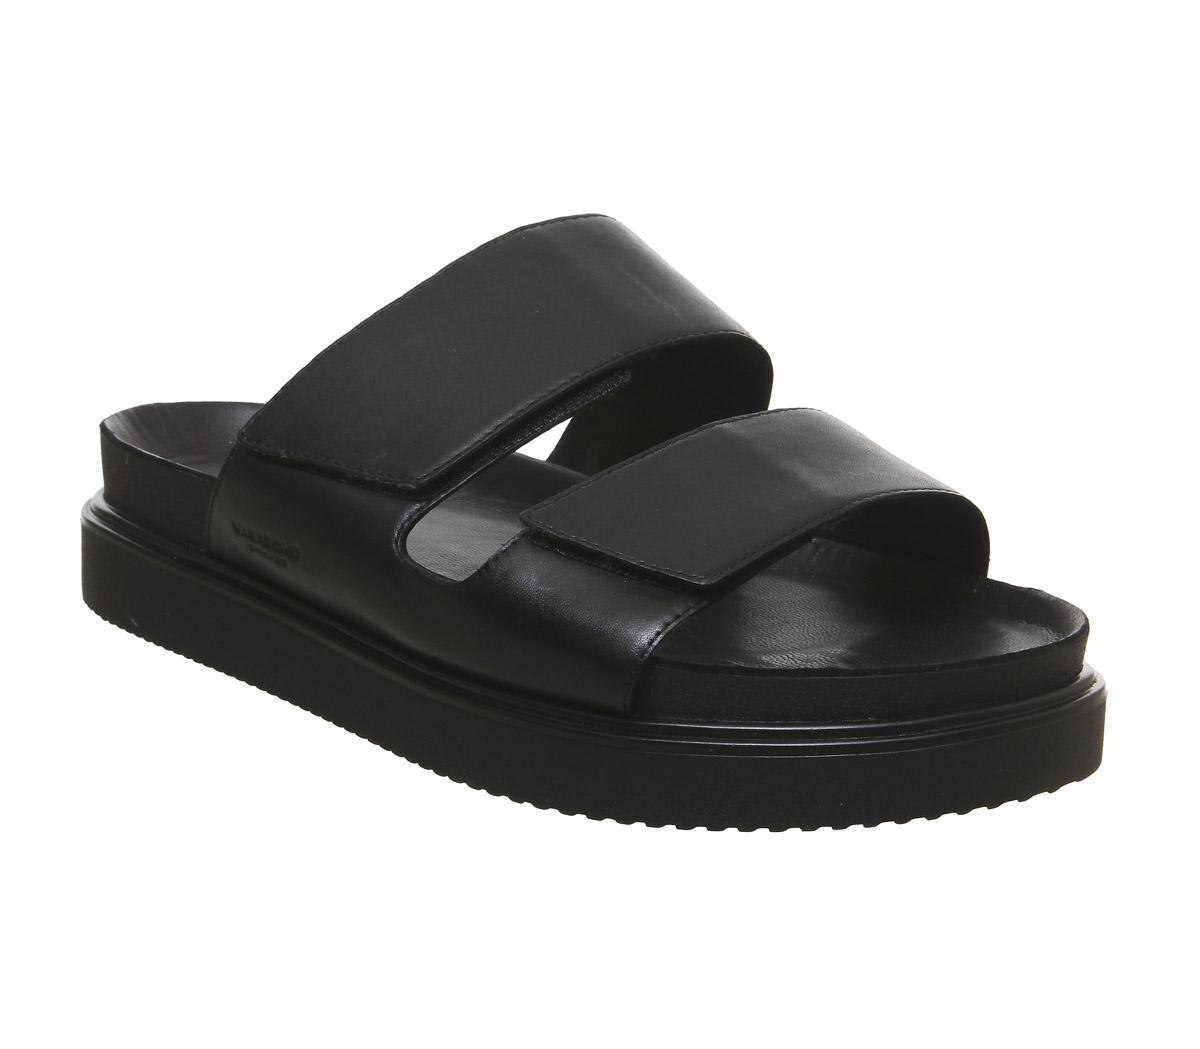 Seth Two Strap Sandals